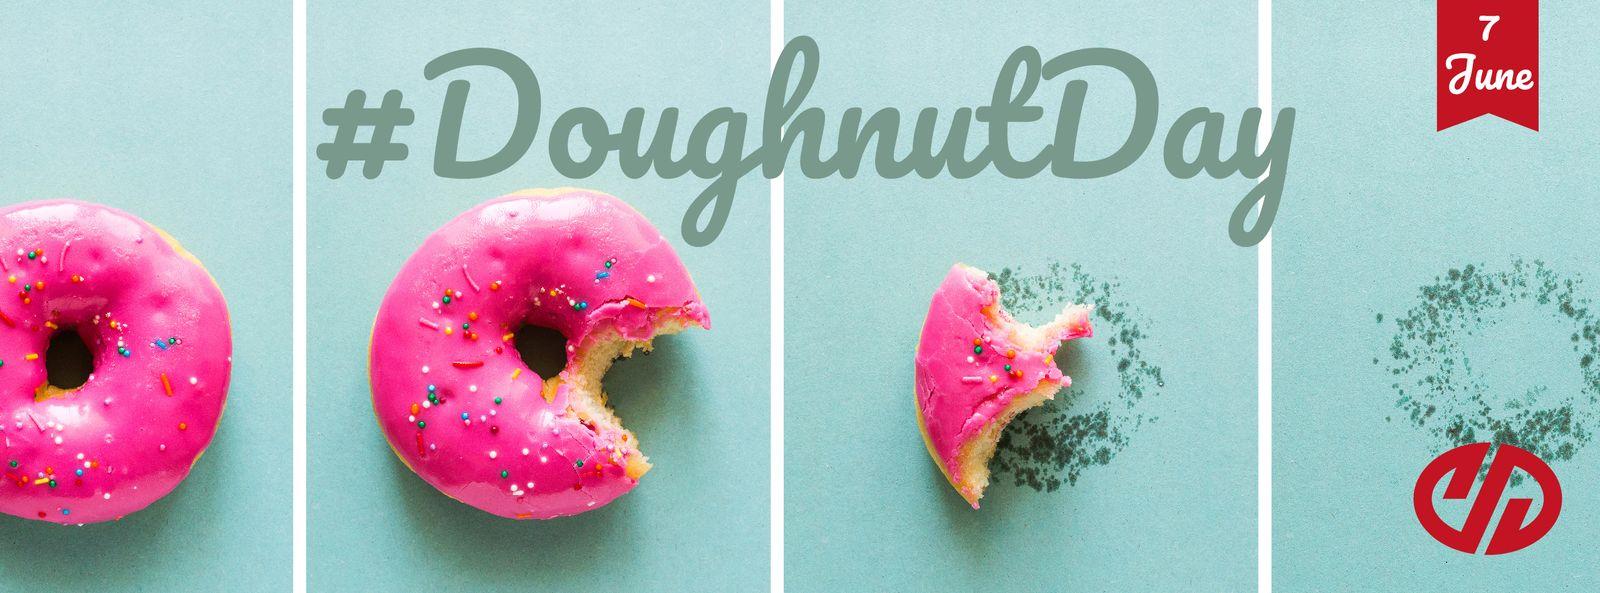 3 ITSM Do not for #DoughnutDay